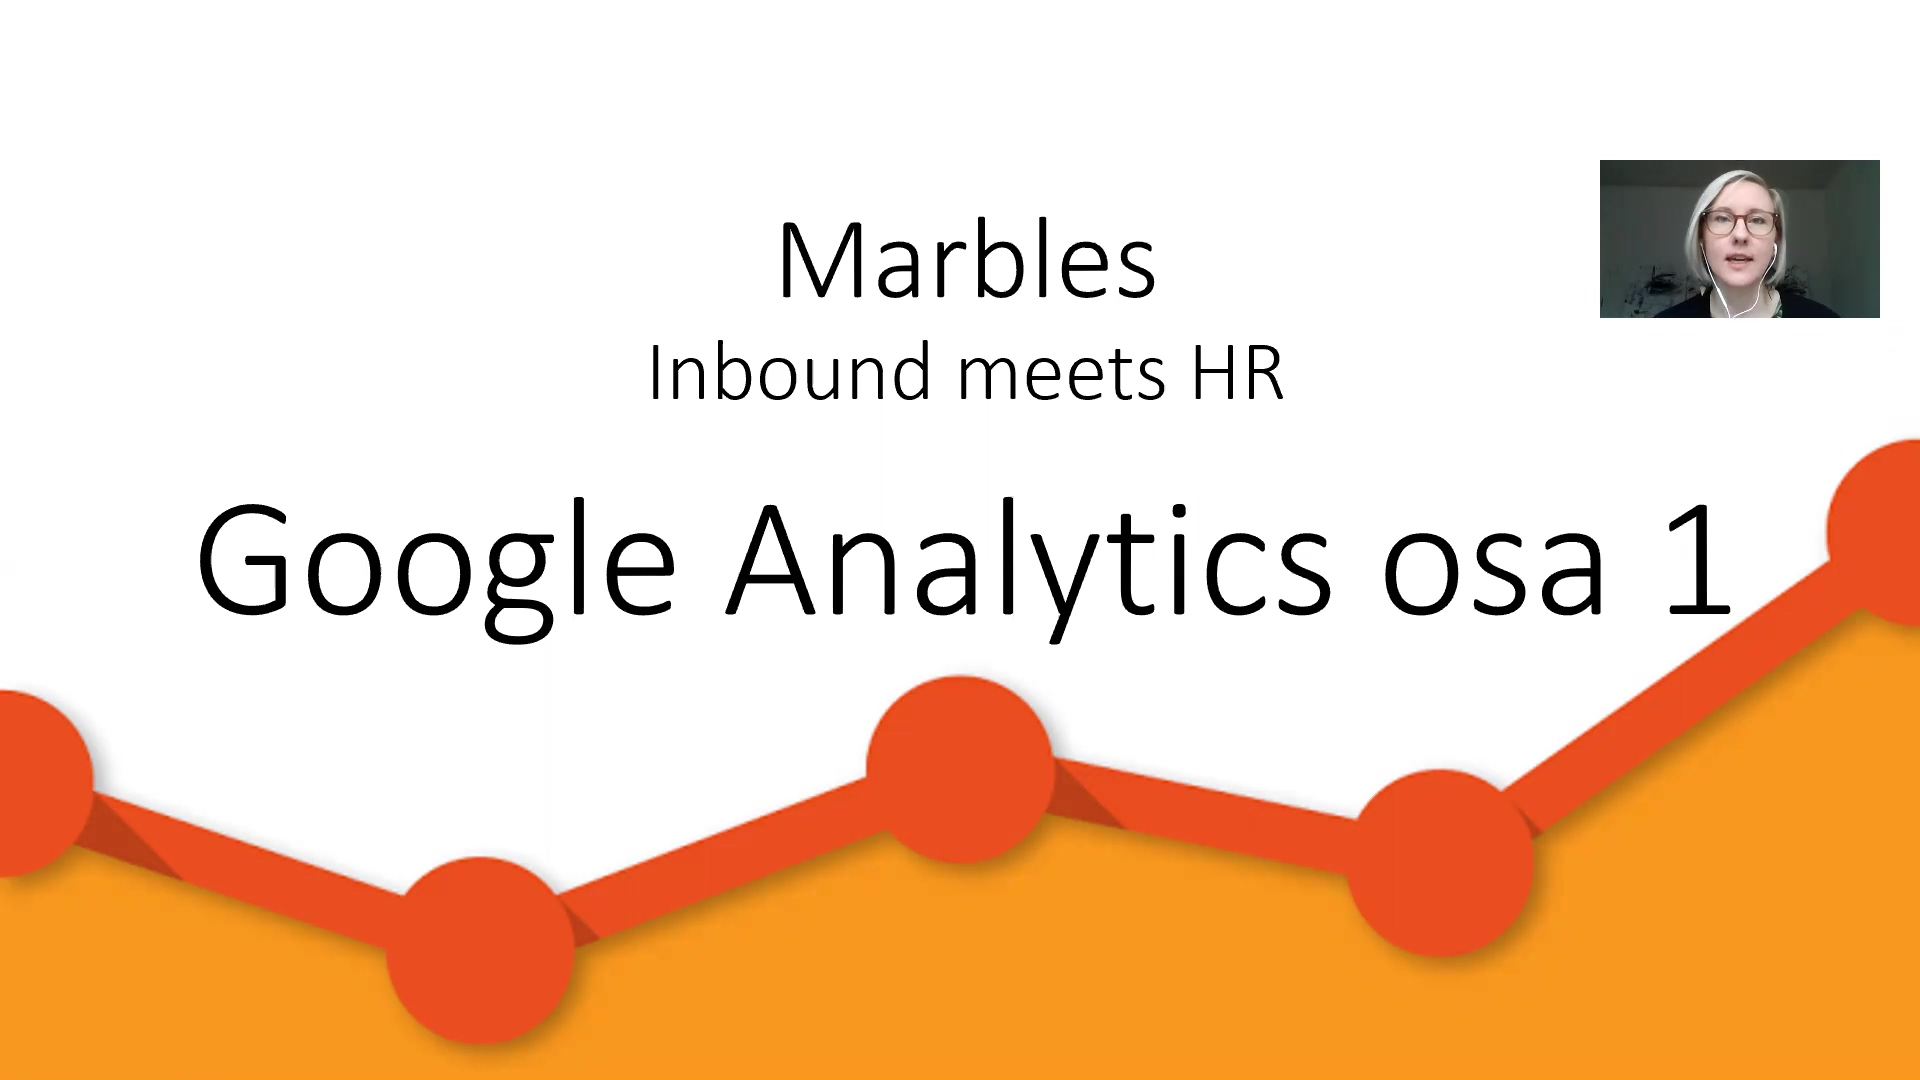 Marbles_HR_Quru_MiraMakiranta_GoogleAnalytics_Osa1